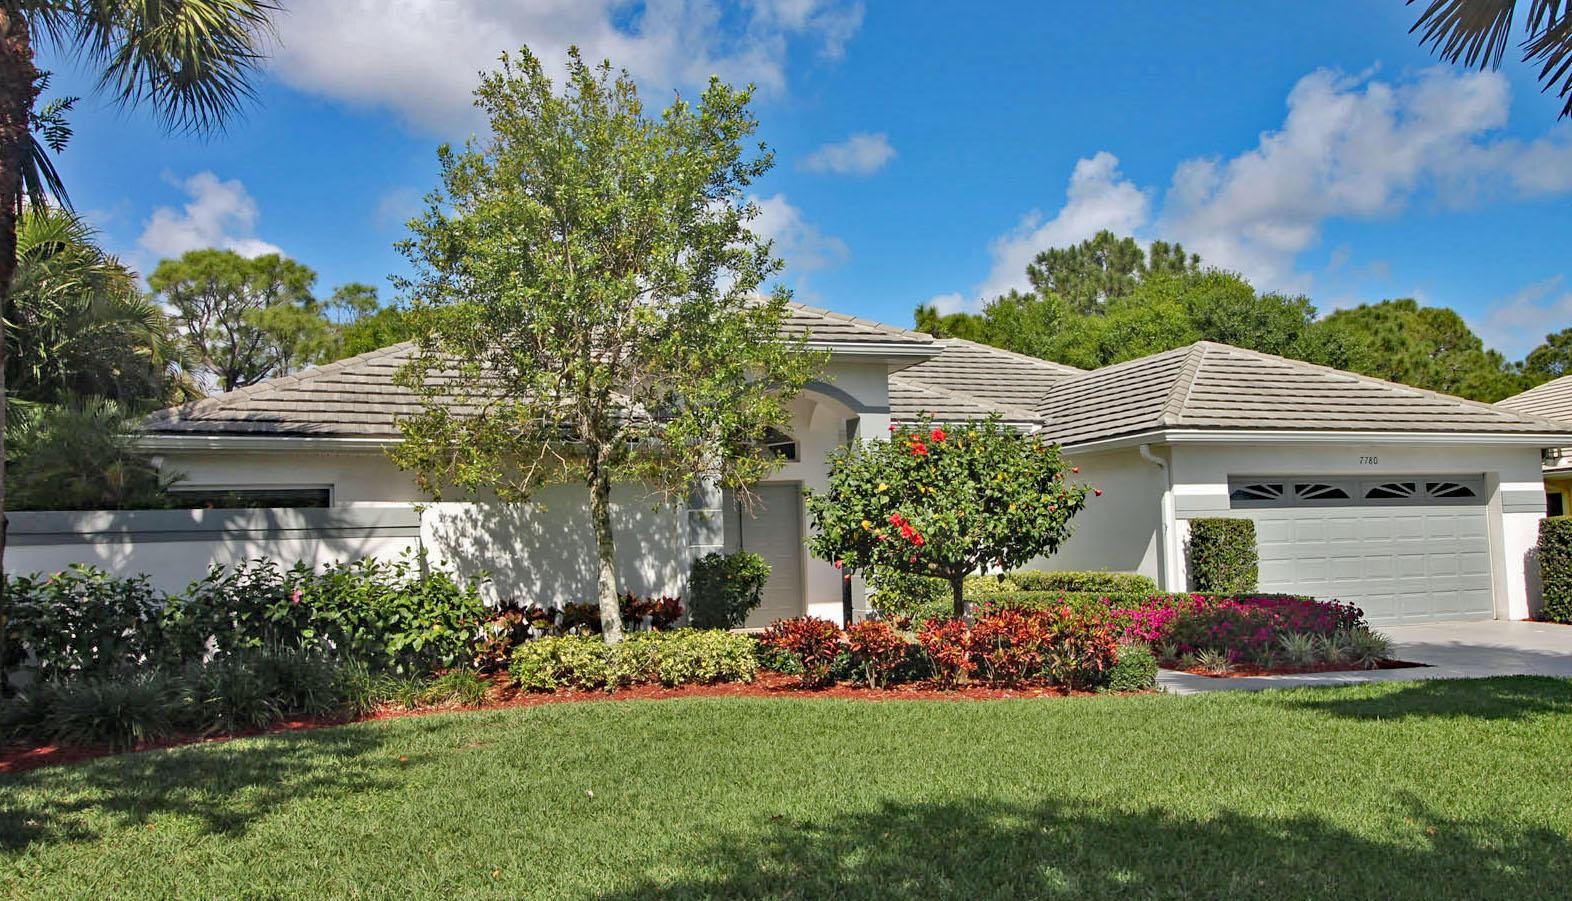 7780 Lucida Lane, Hobe Sound, Florida 33455, 3 Bedrooms Bedrooms, ,2 BathroomsBathrooms,A,Single family,Lucida,RX-10611853